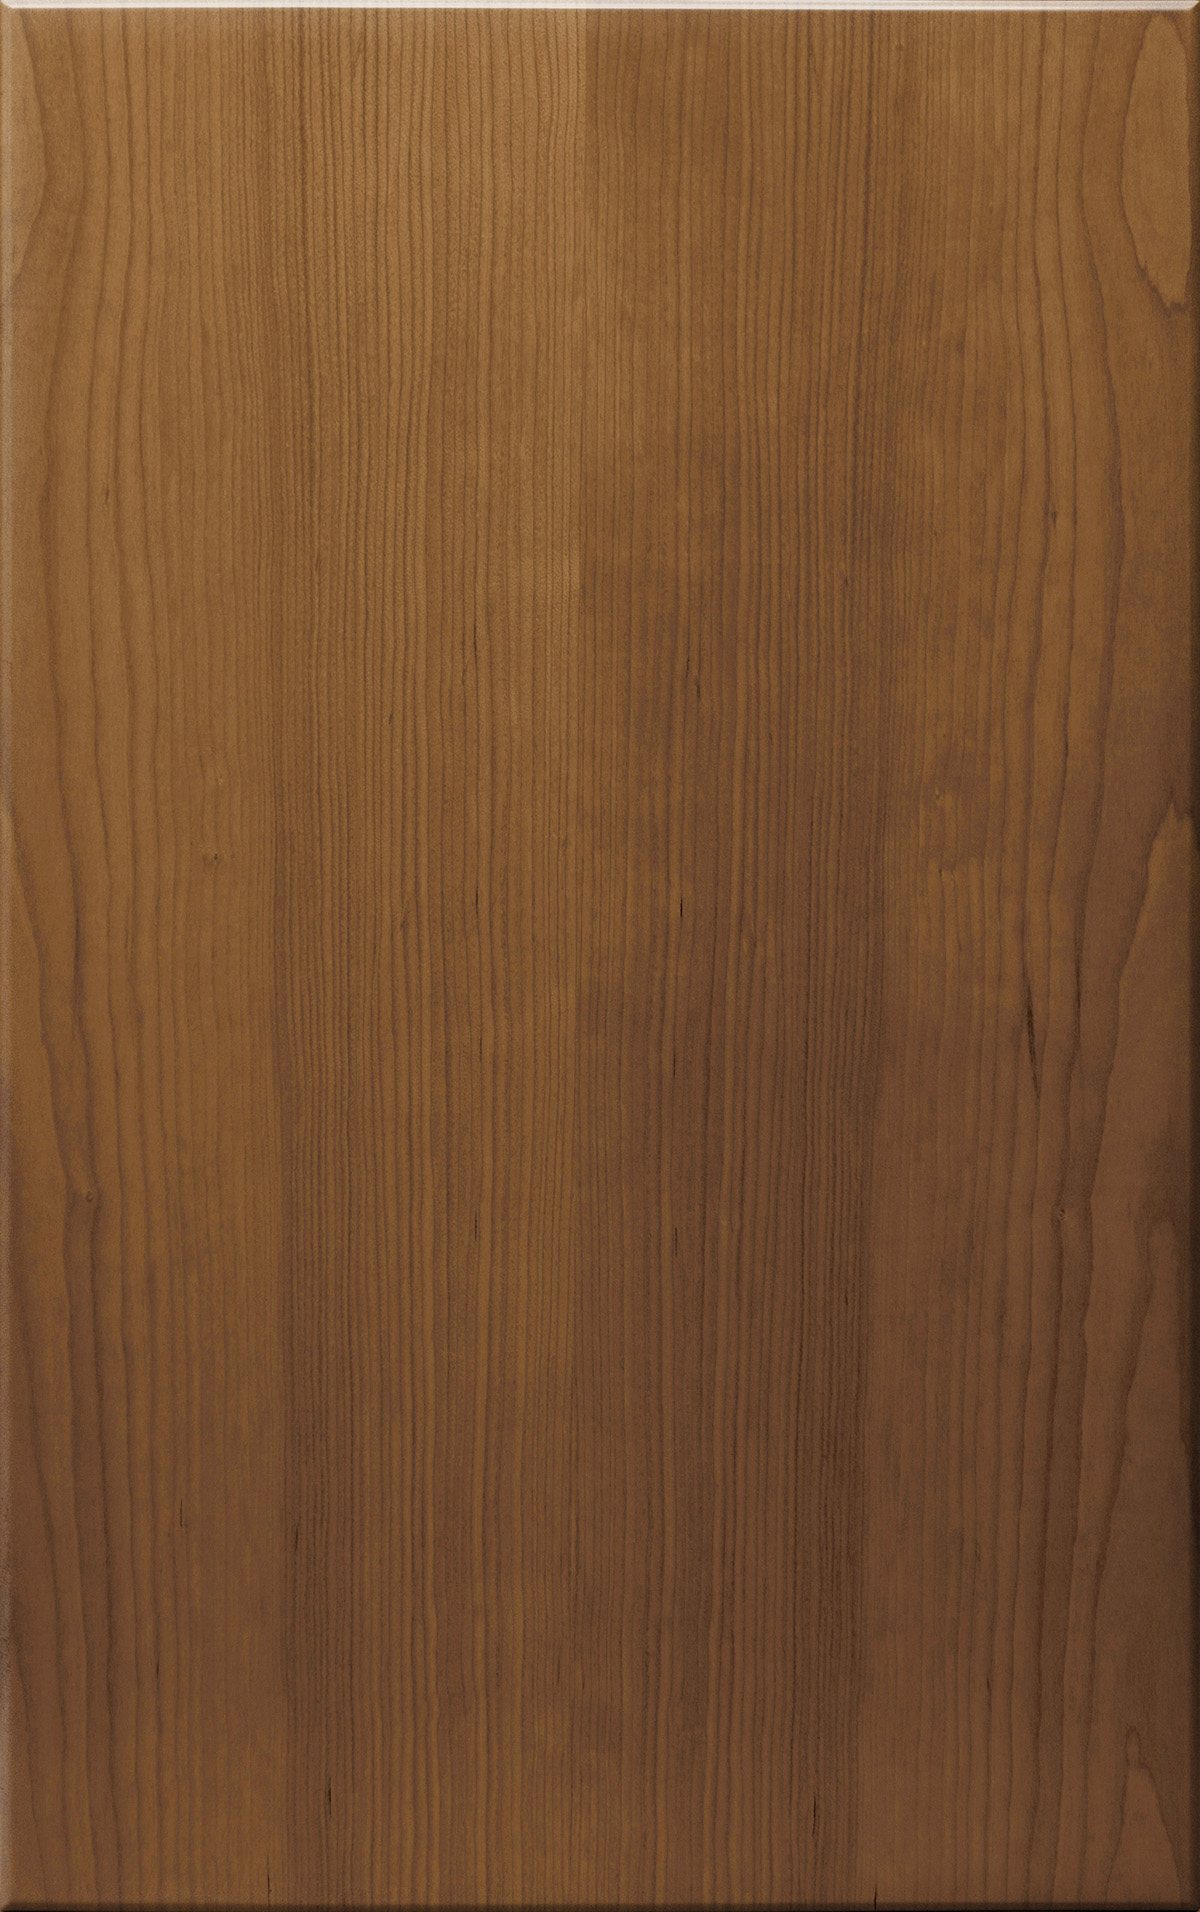 Roasted Barley (Cherry)